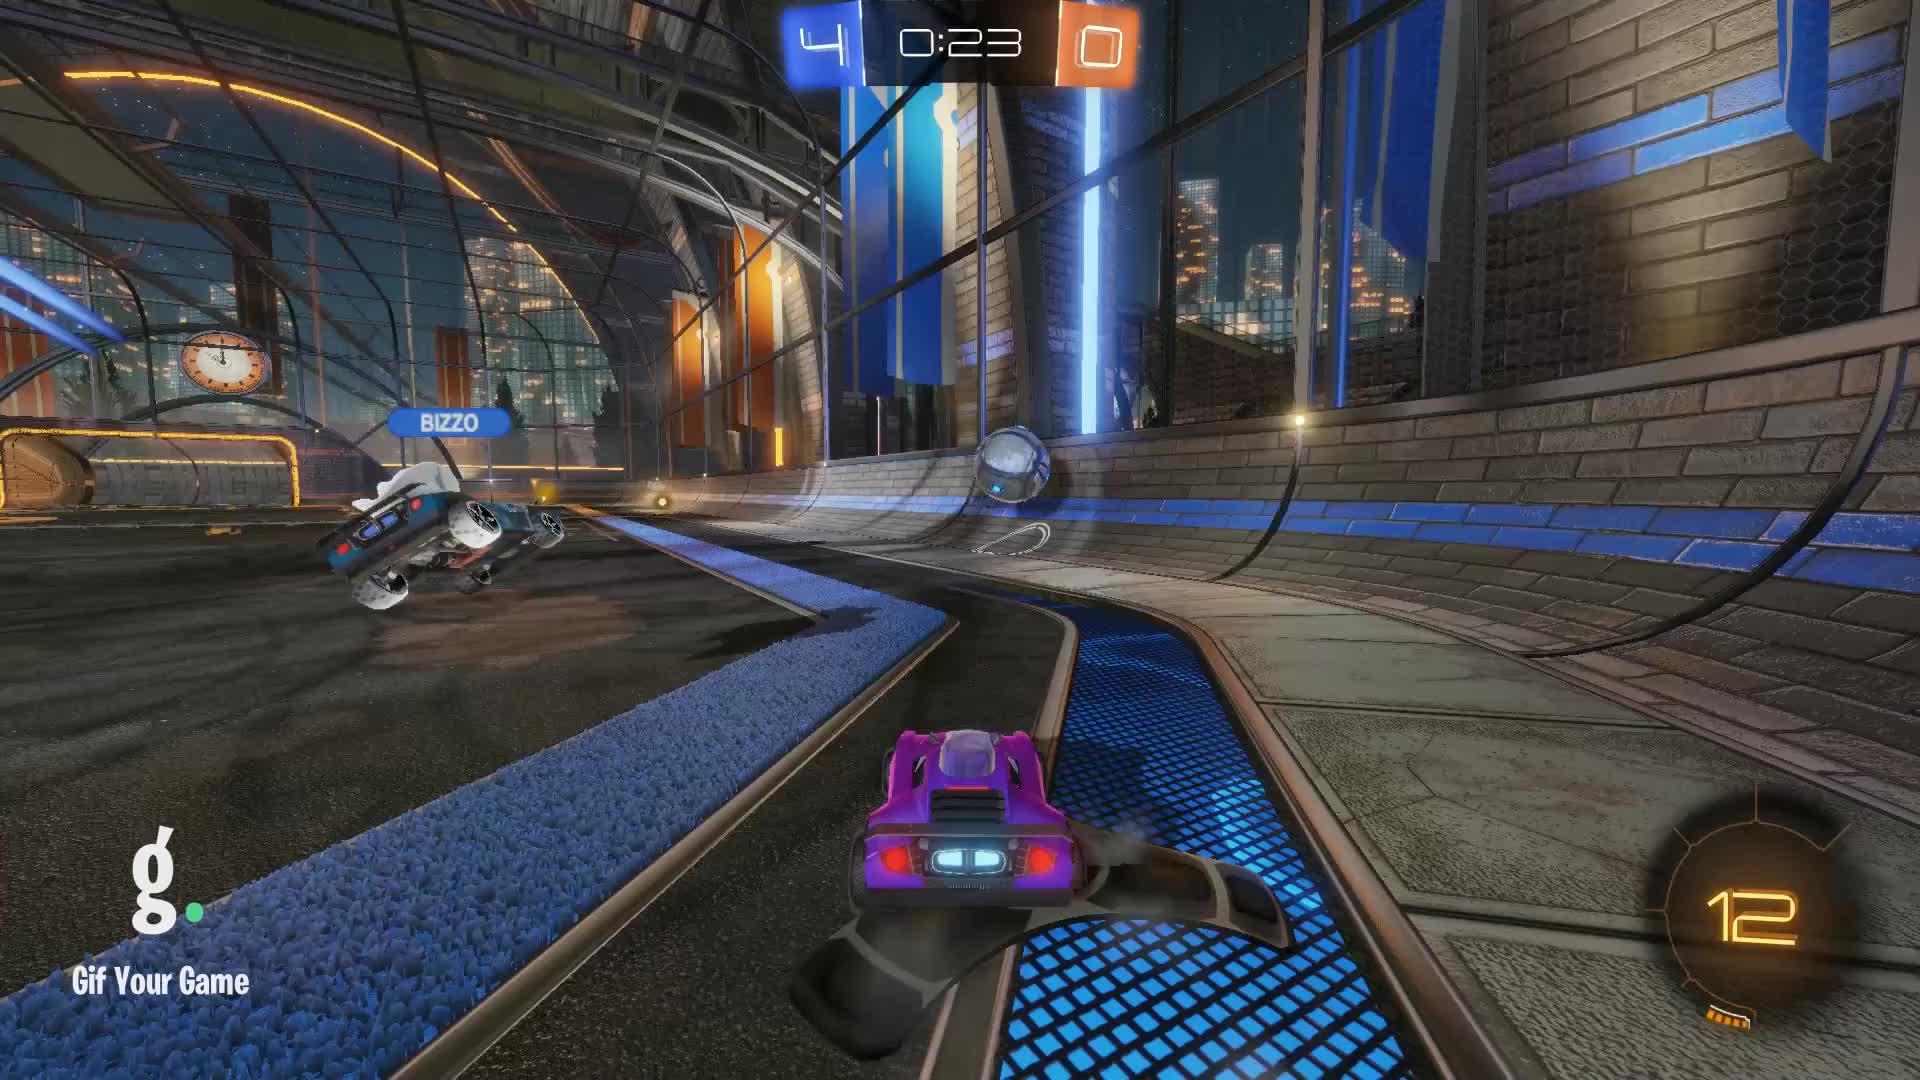 Gif Your Game, GifYourGame, Goal, JazZ, Rocket League, RocketLeague, Goal 5: JazZ GIFs